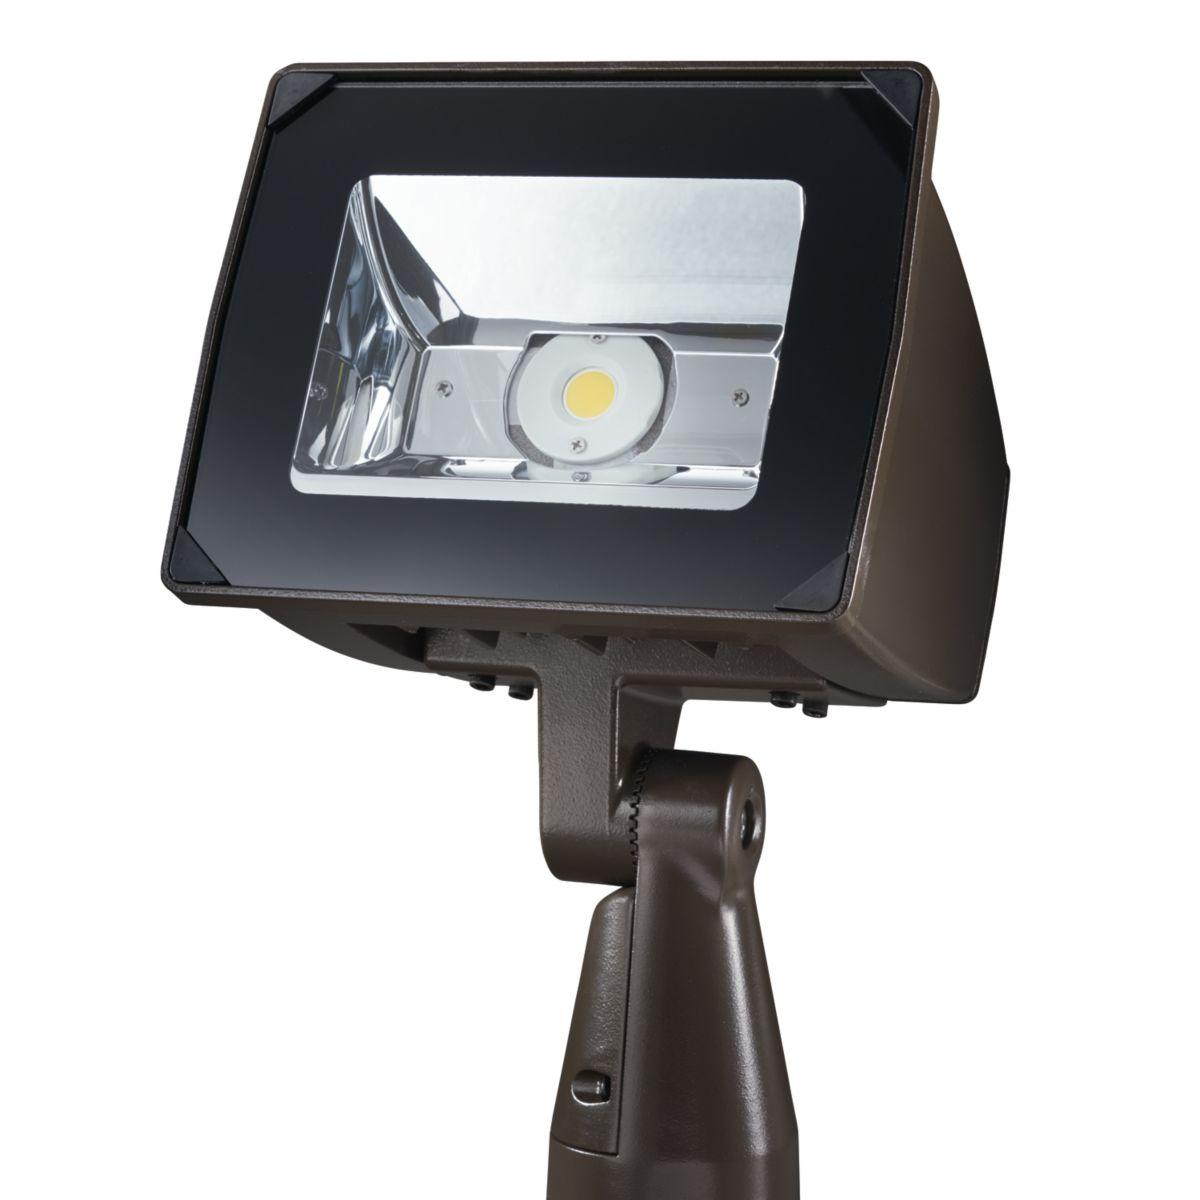 UFLD-S Small Utility Floodlight